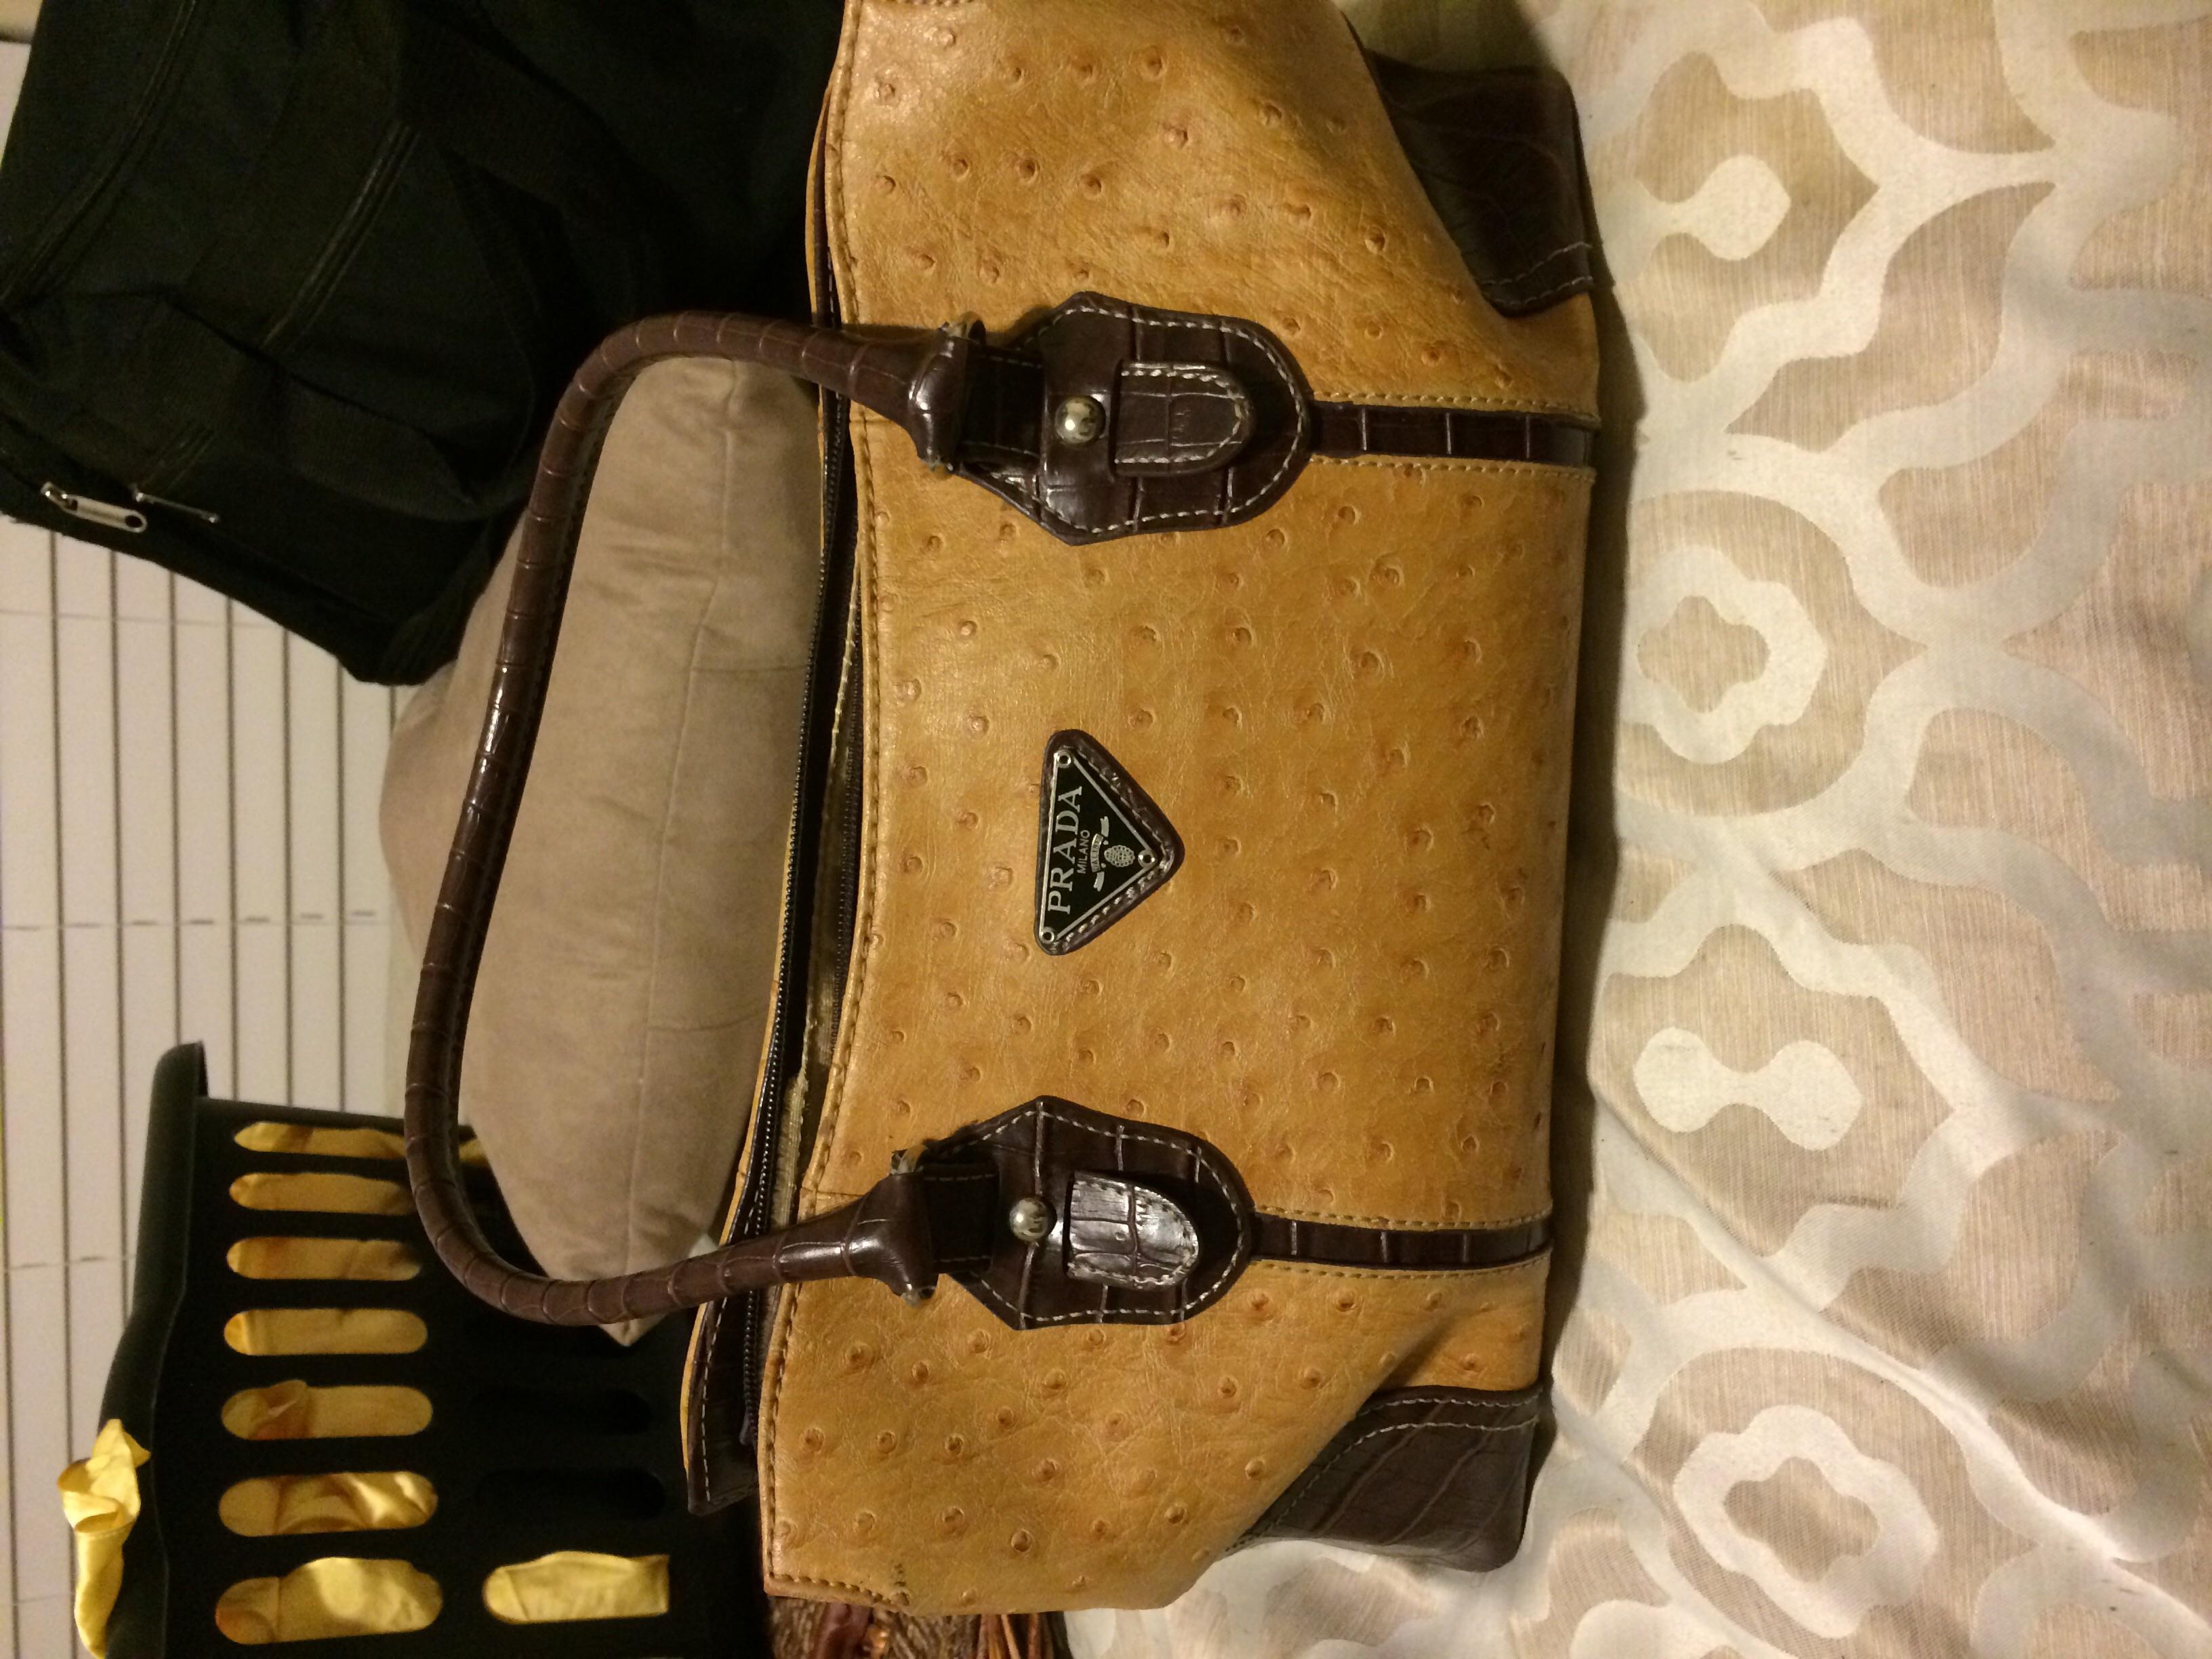 Prada Milano leather 100% authentic